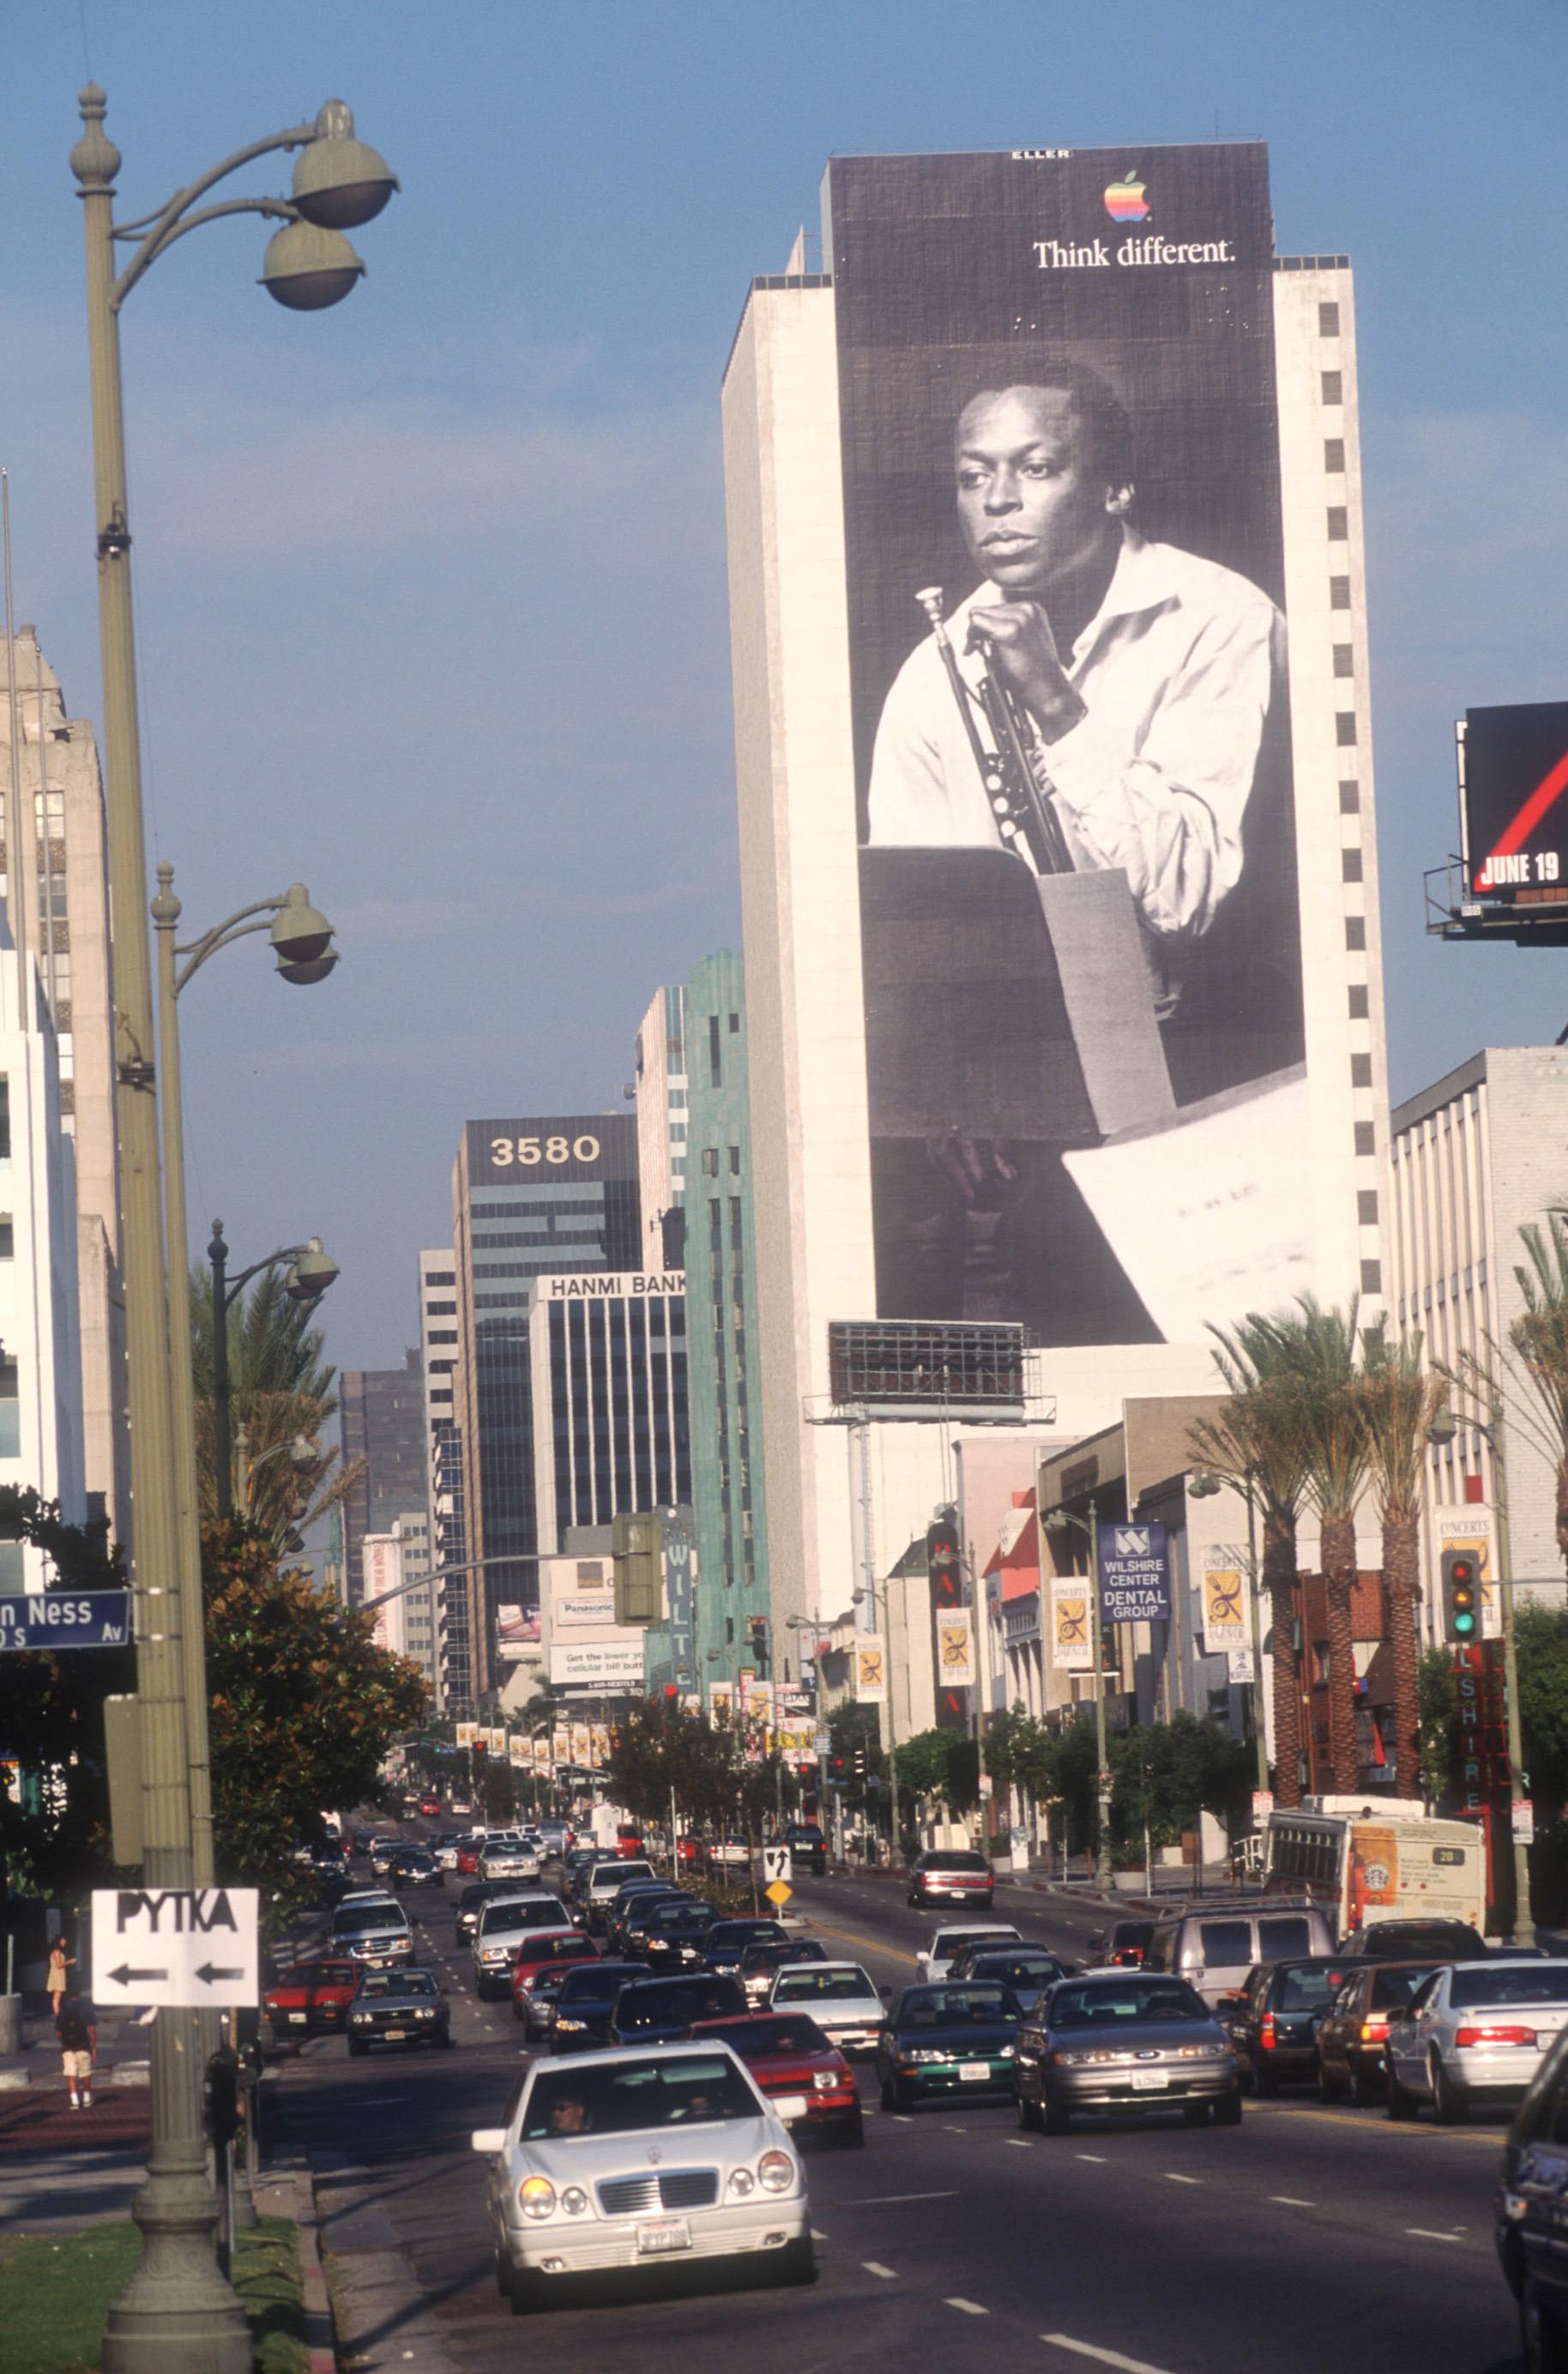 A billboard depicting Miles Davis promotes Apple Computers